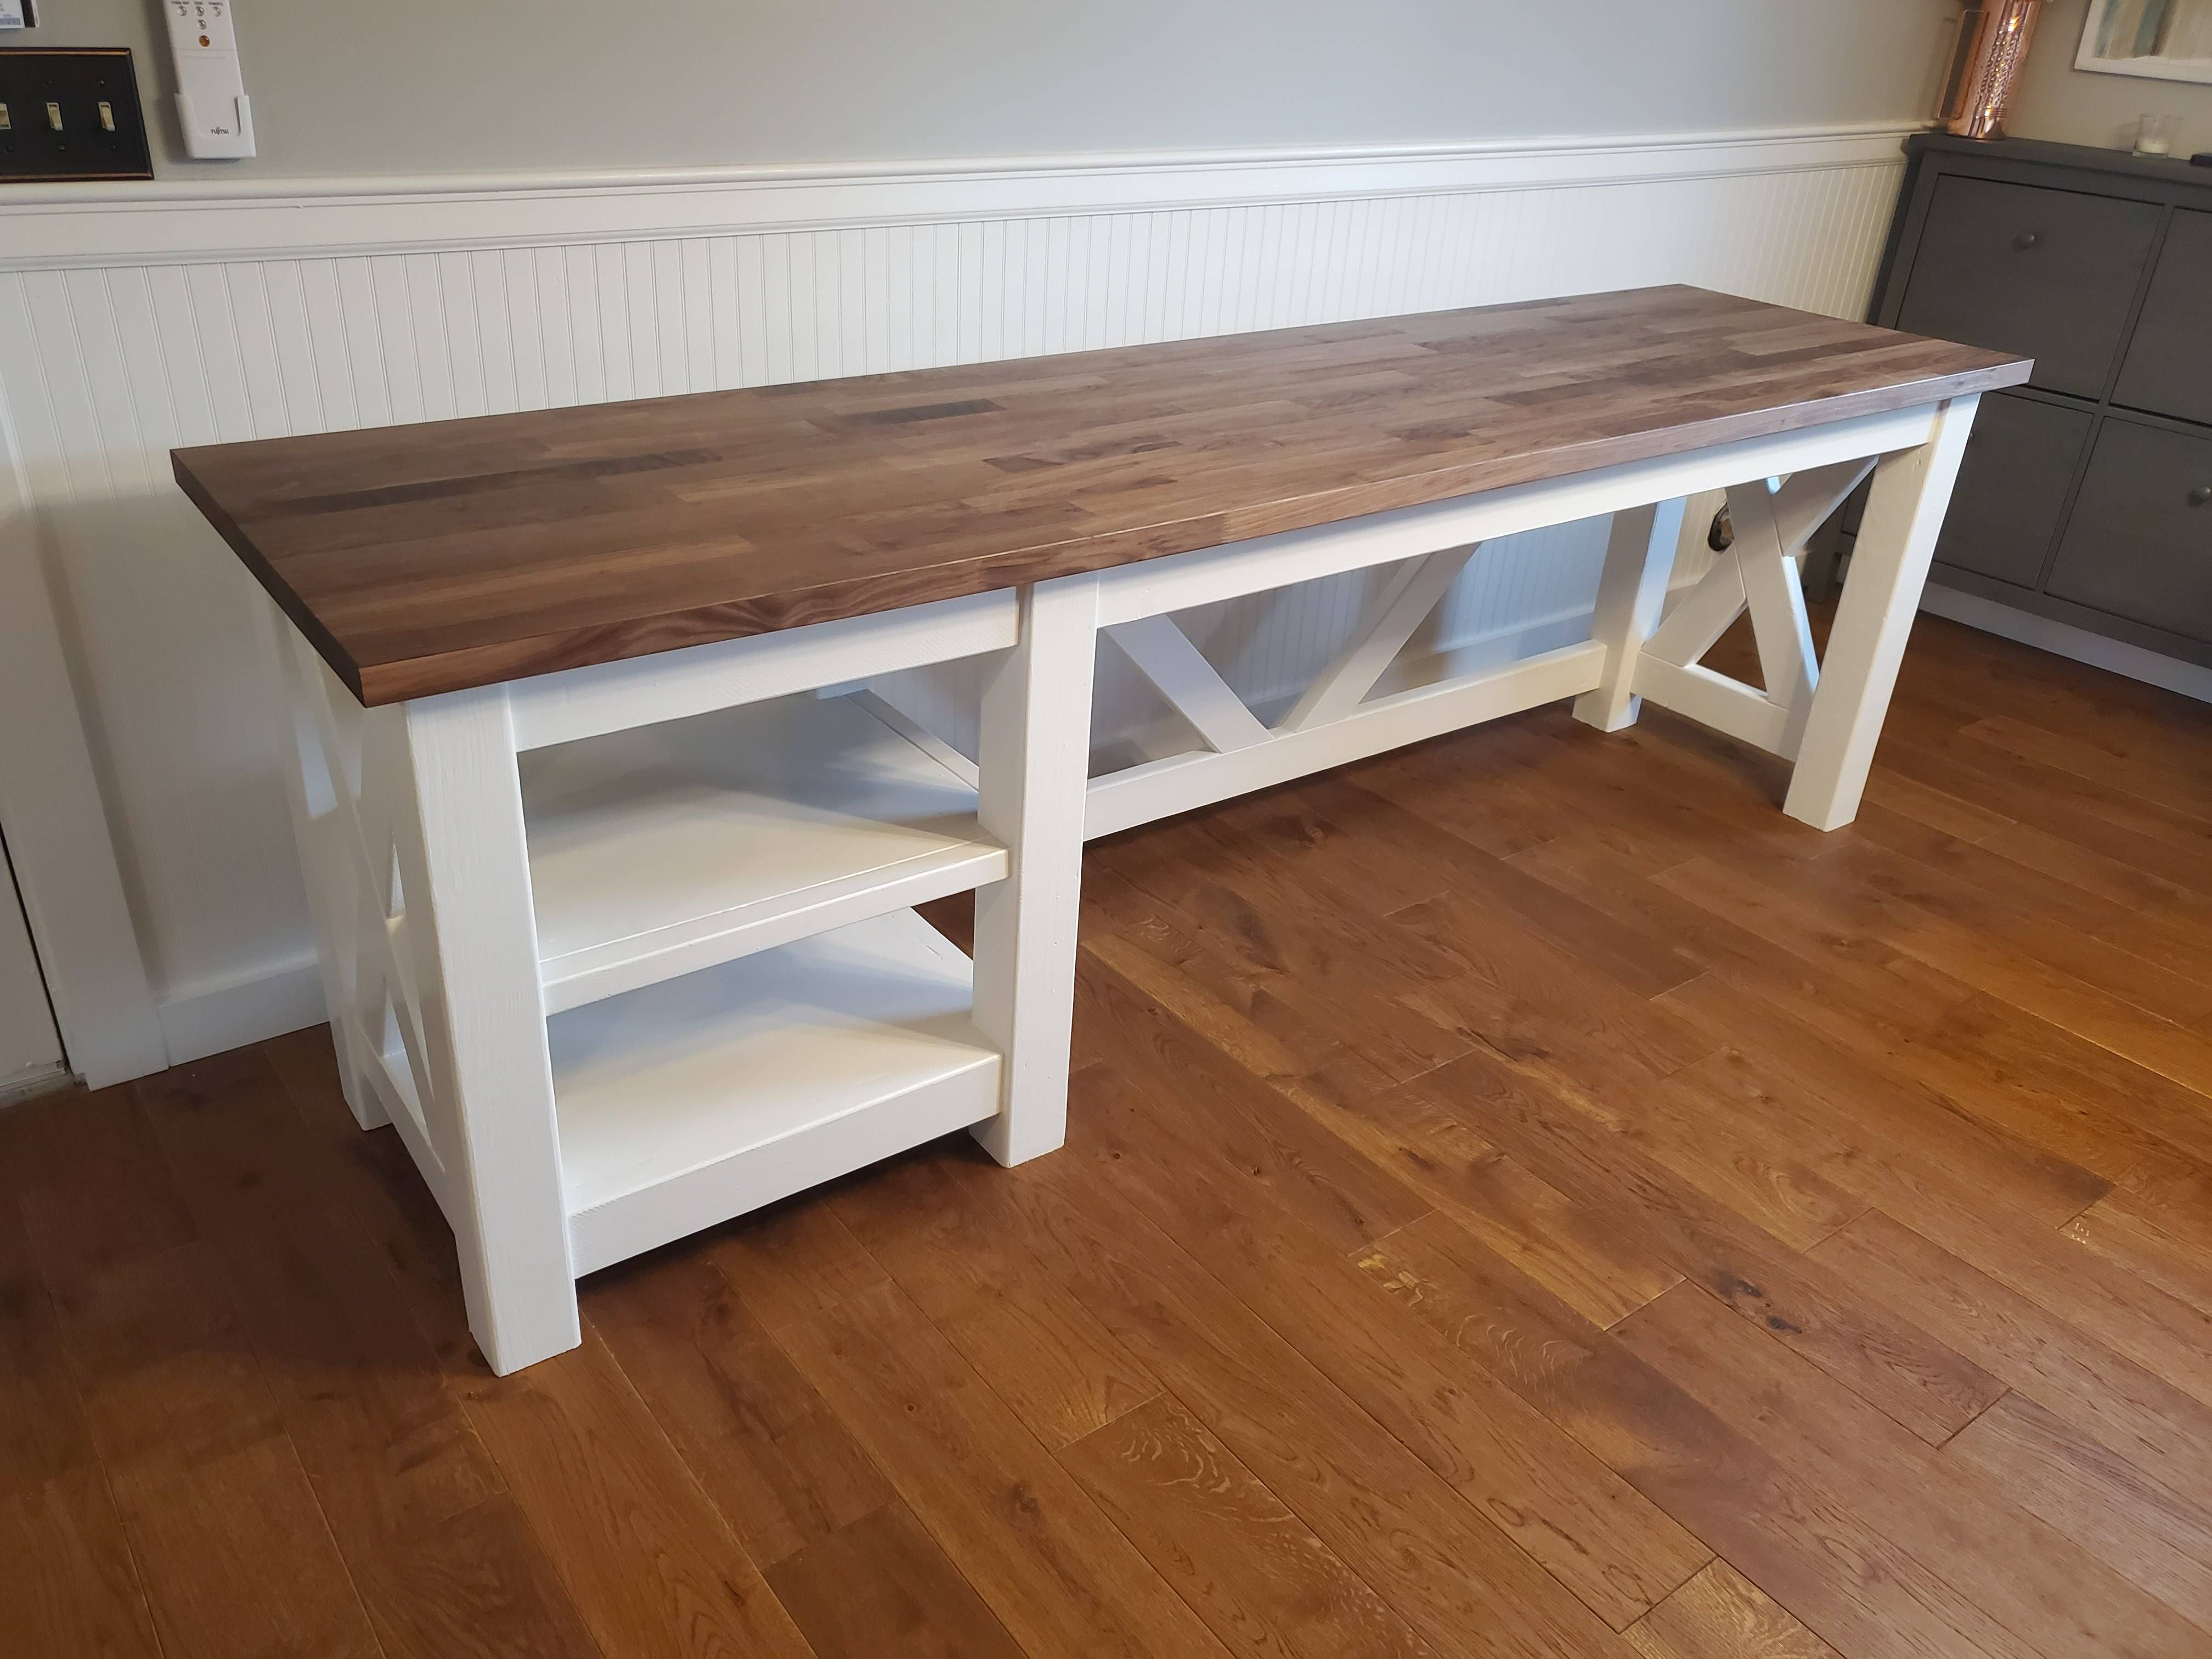 Built A Farmhouse Office Desk Using An Ikea Butcher Block Countertop Just In Time For Quarantin In 2020 Ikea Butcher Block Butcher Block Countertops Butcher Block Desk